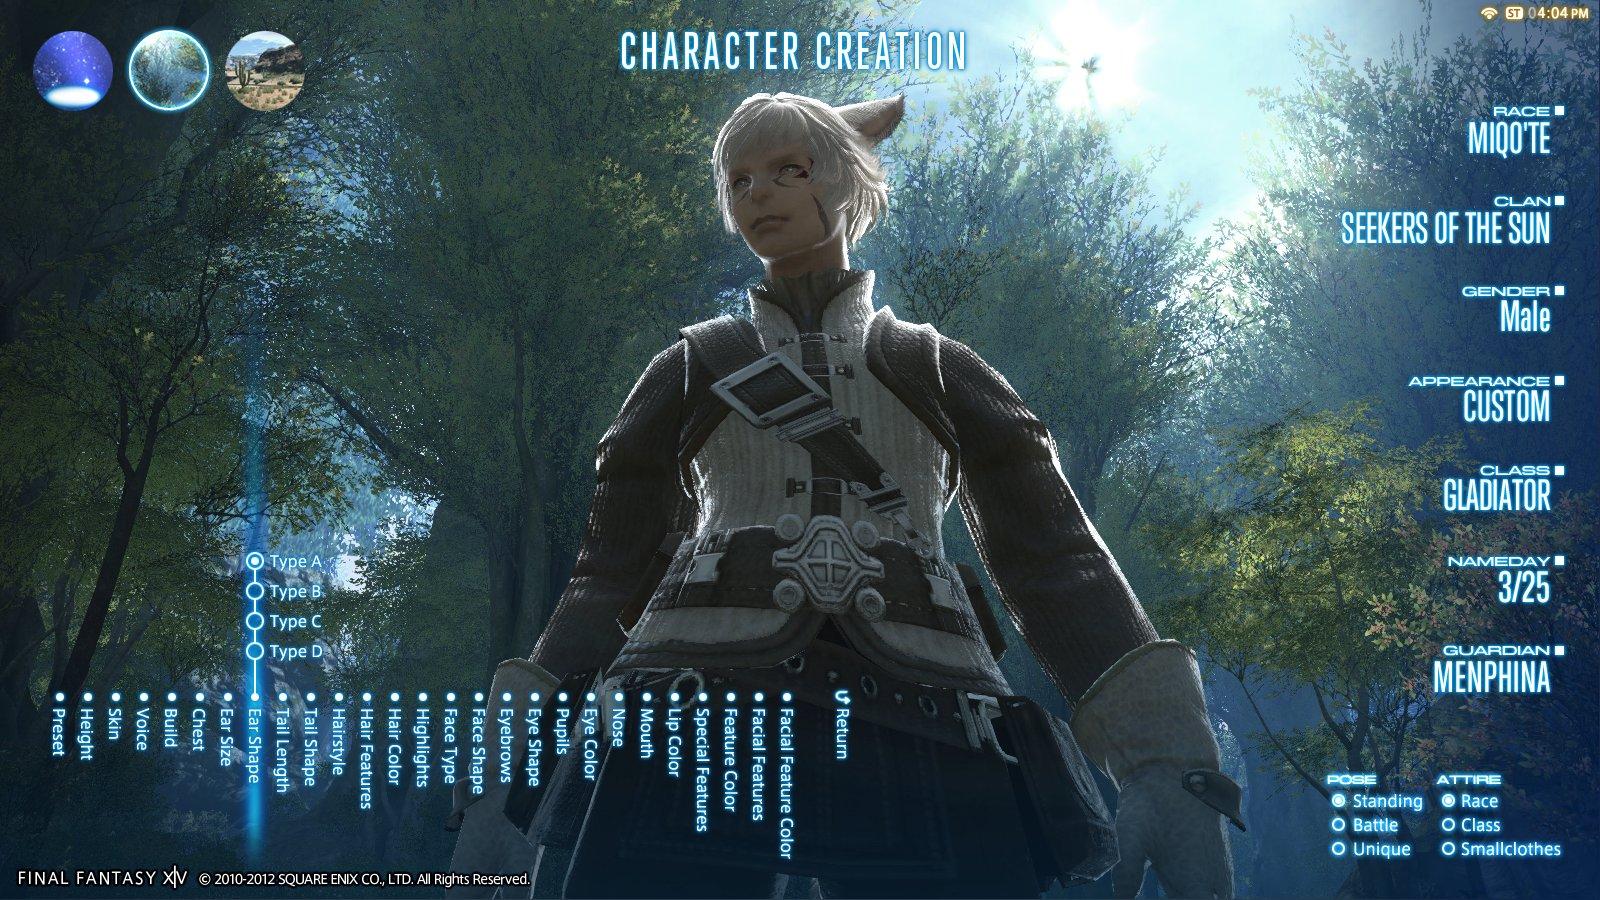 E3で発表された新生のスクリーンショットにも新種族「ミコッテ男」の姿が